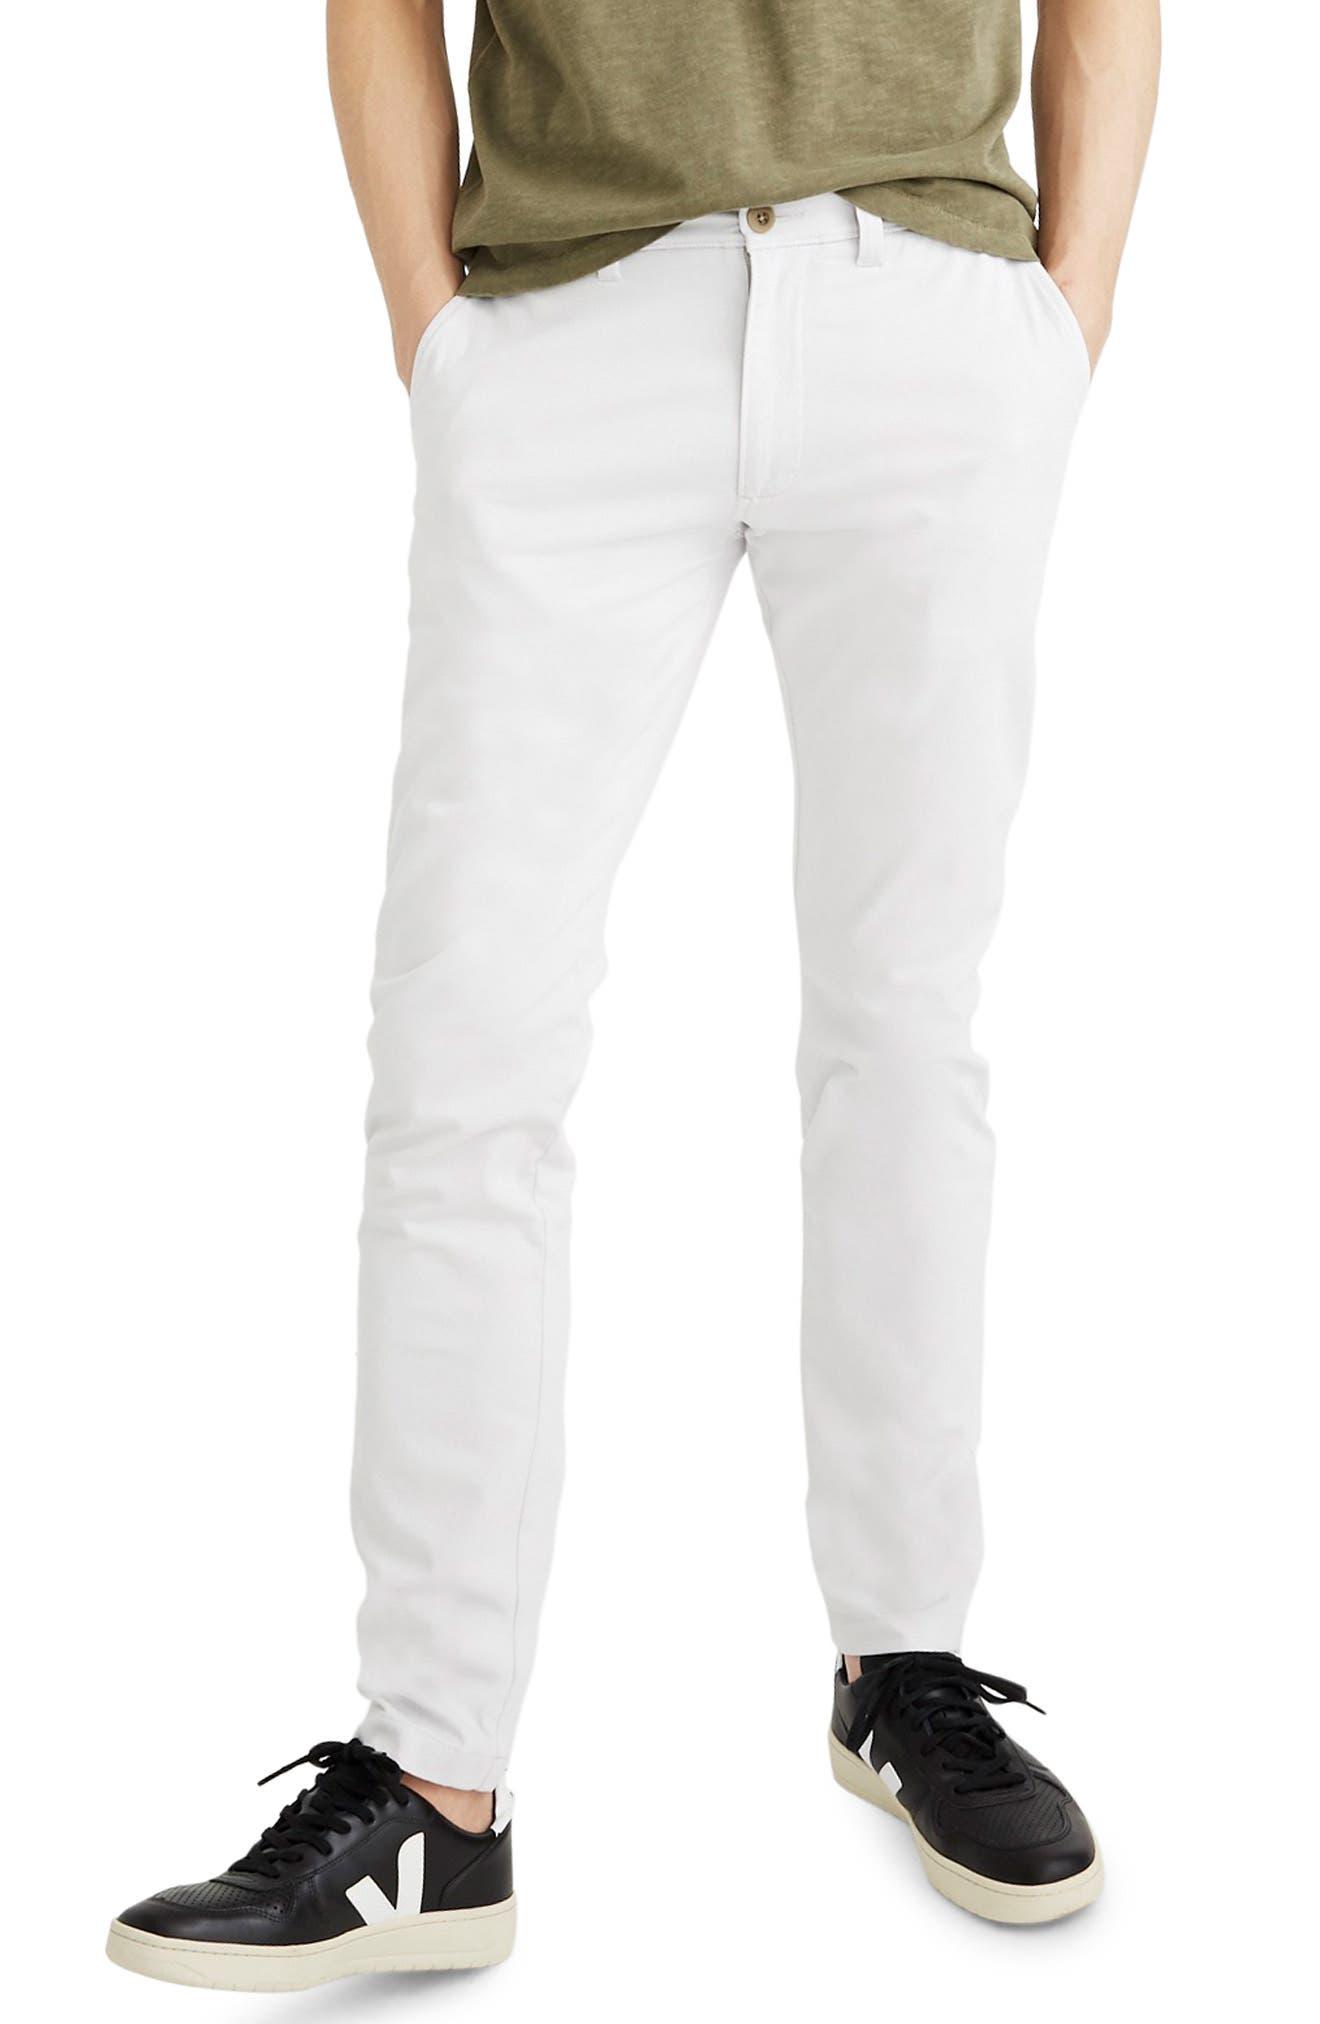 Madewell Penn Slim Fit Chino Pants, Grey